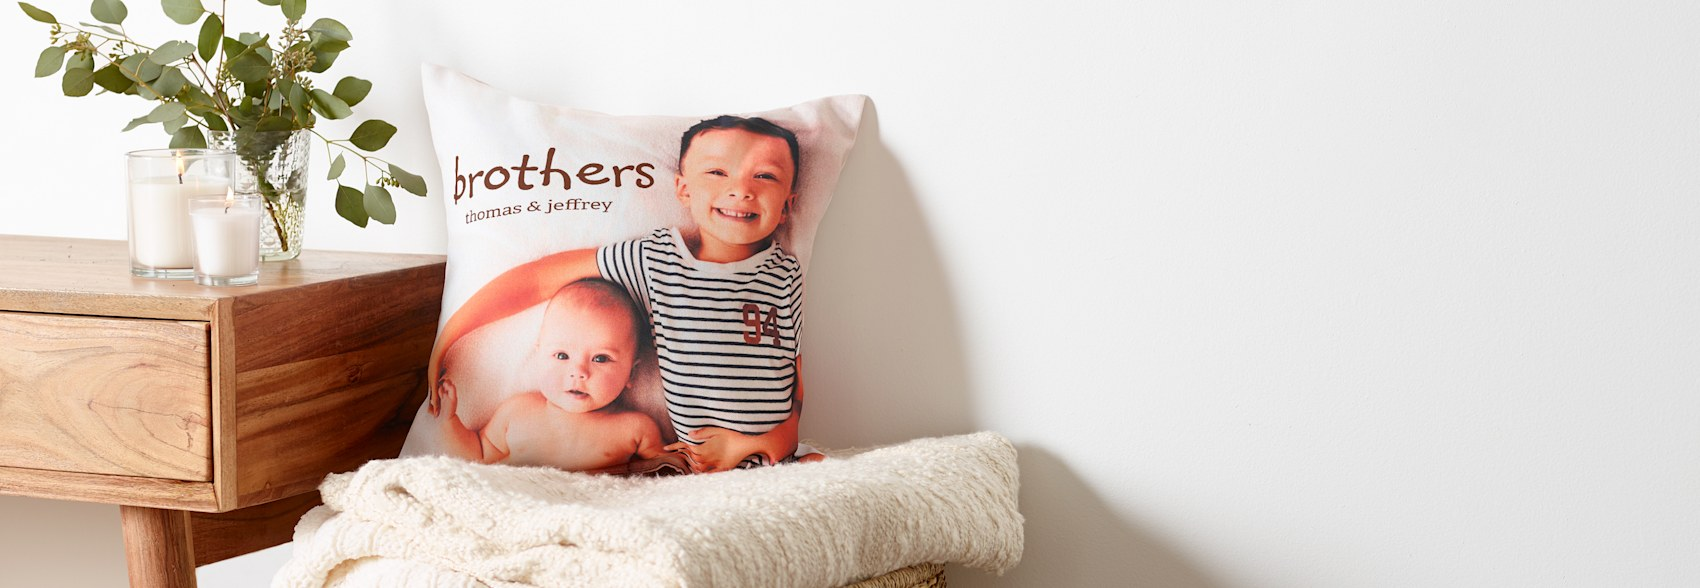 custom pillows with kids photos